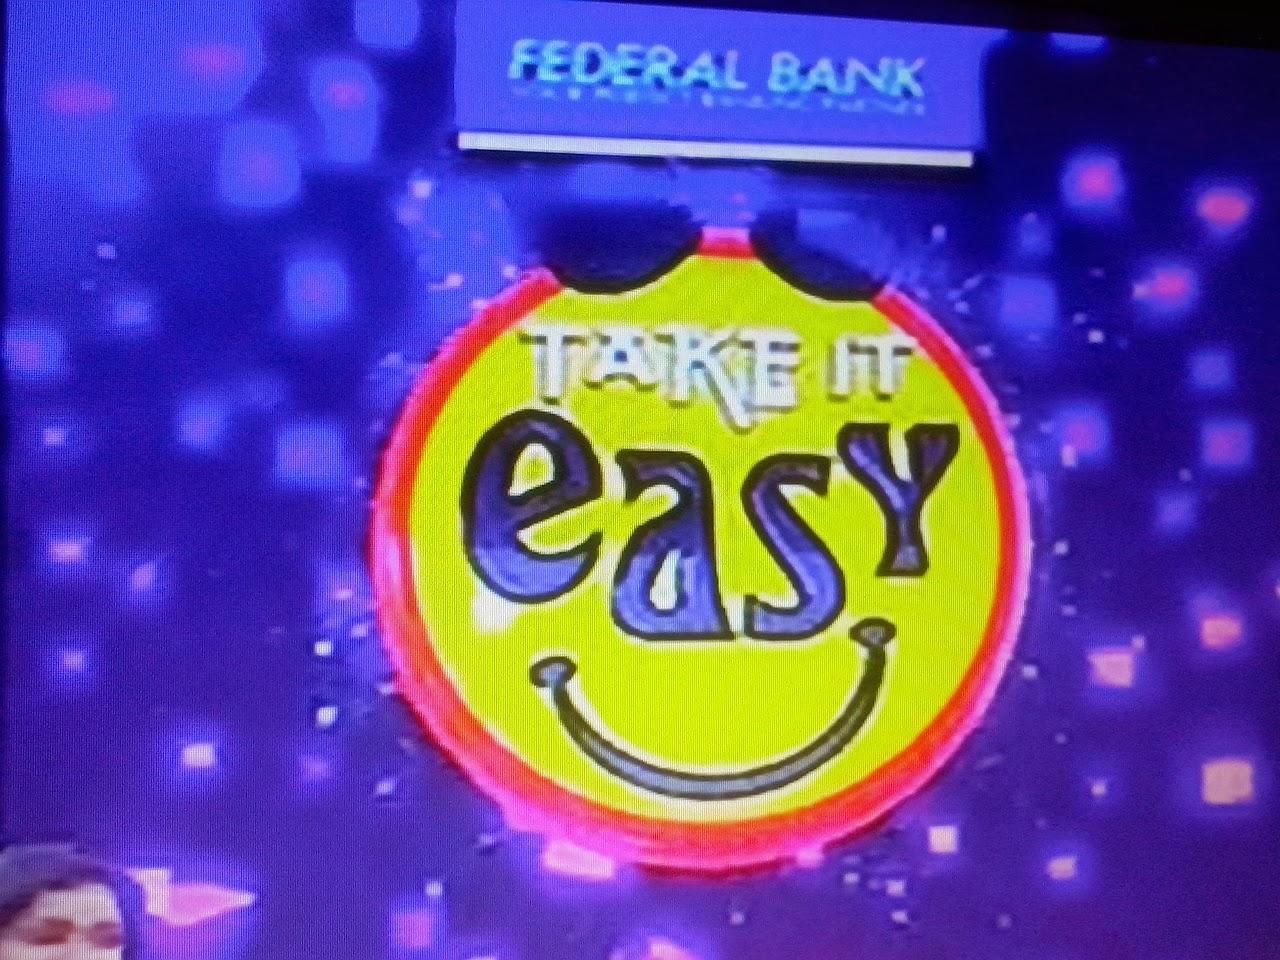 Take it easy mazhavil manorama episode 87 - Bary achy lagty hain